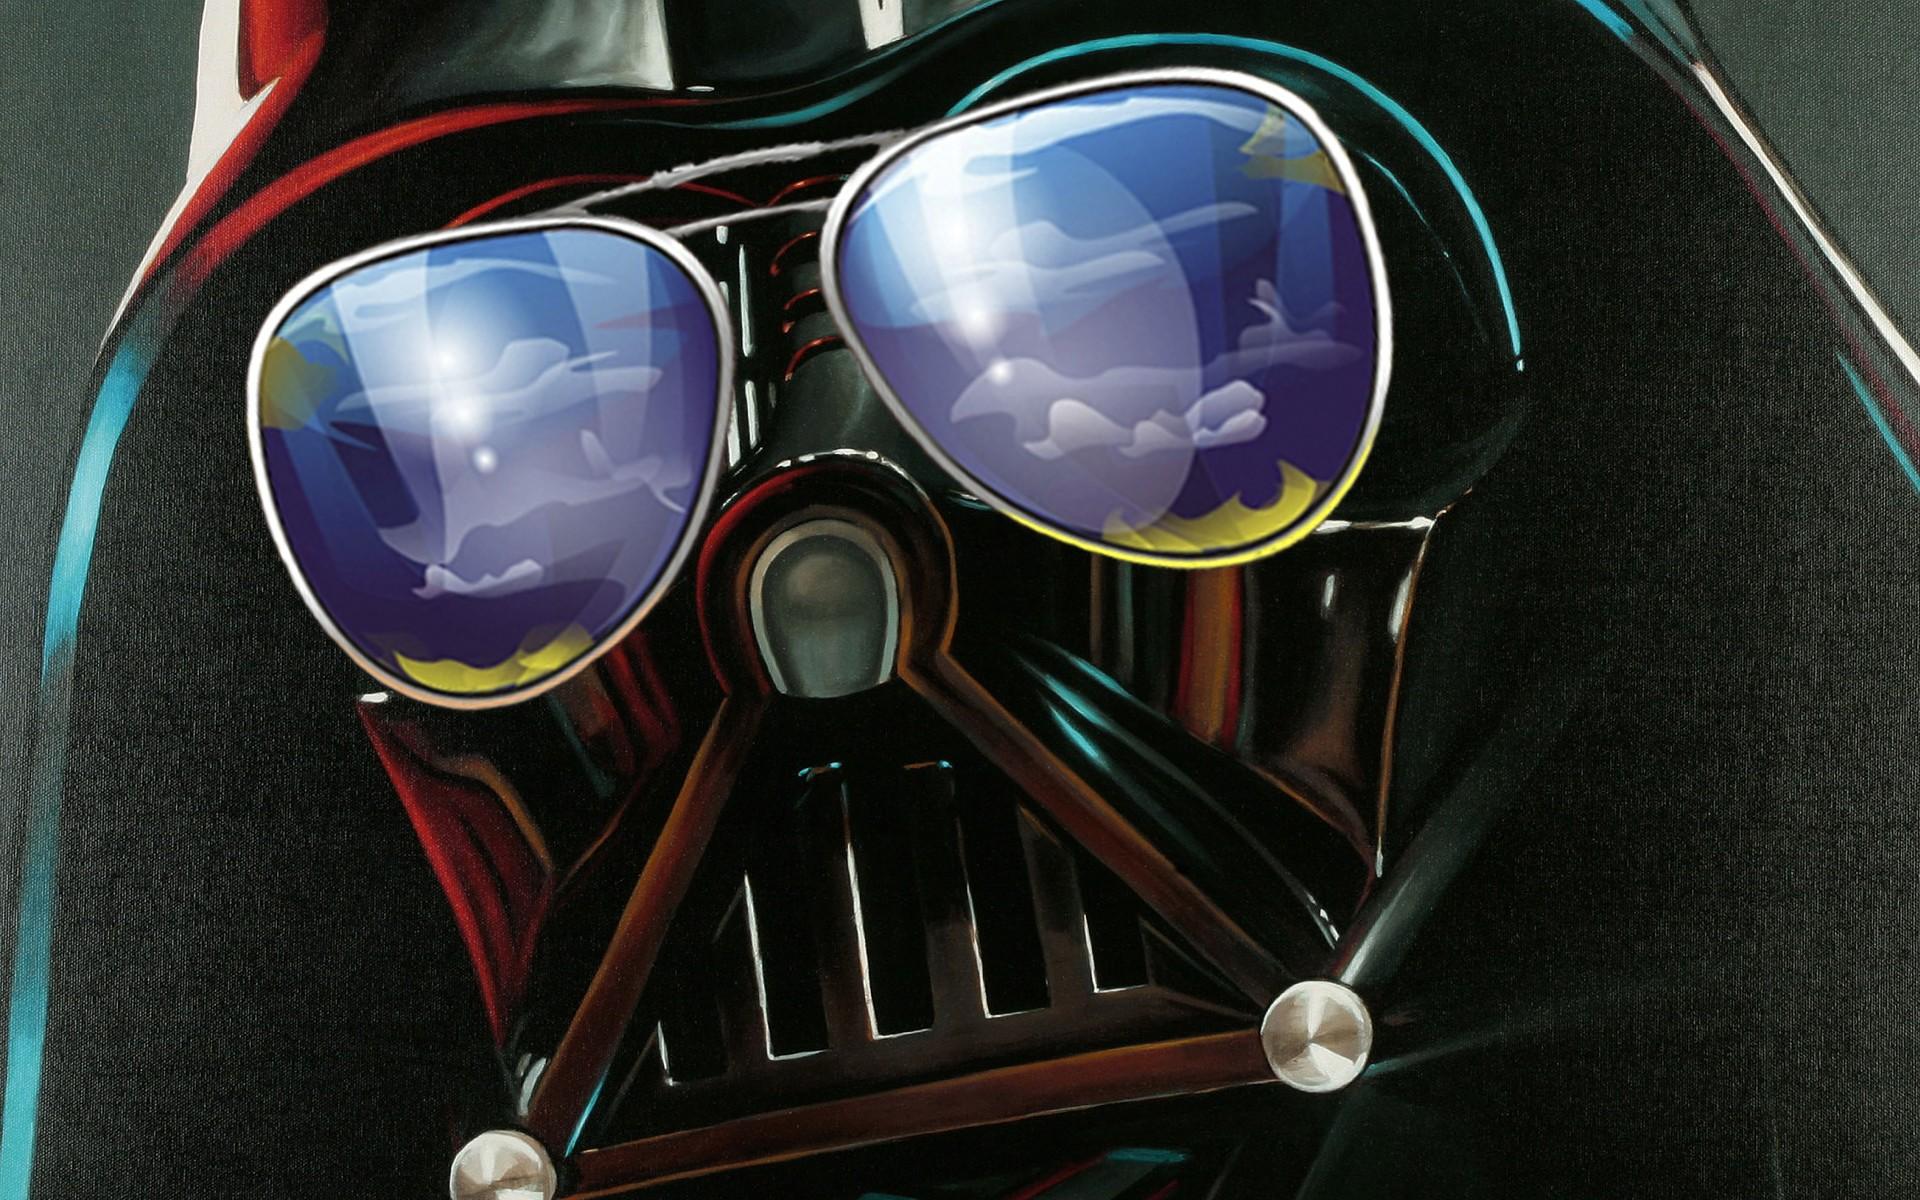 Star Wars the Darth Vader Full HD Desktop Wallpapers 1080p 1920x1200